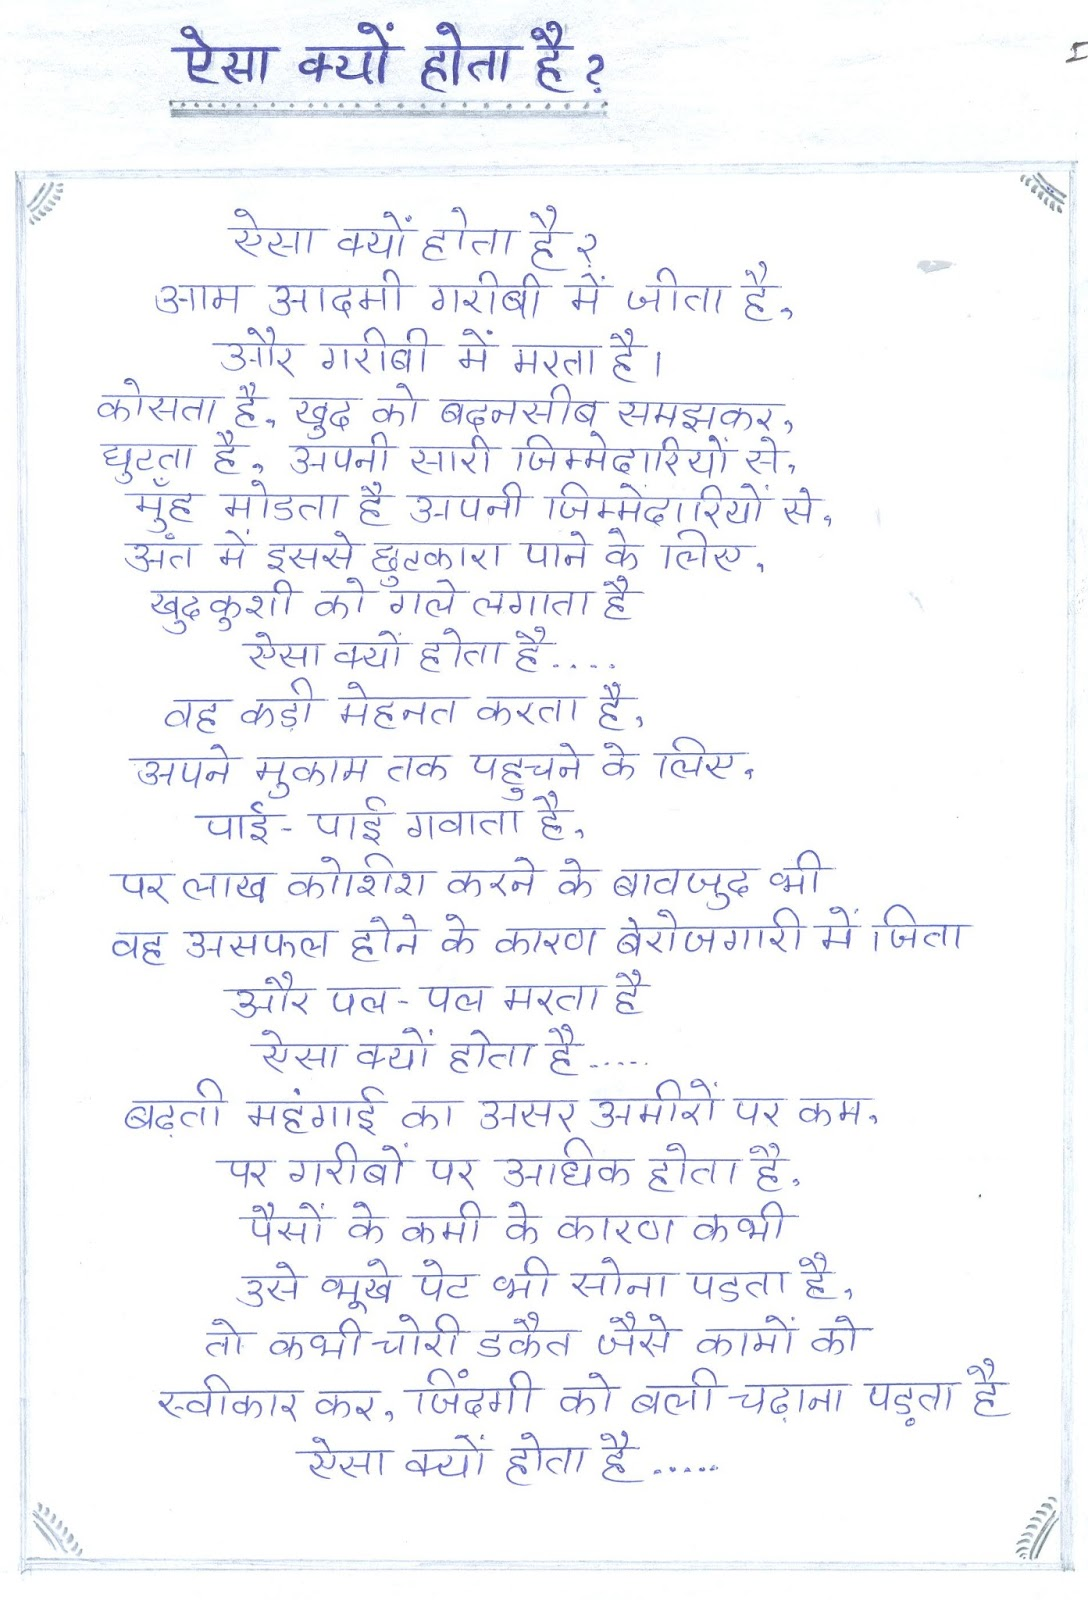 Sanskar-Kala-Darpan: POETRY WRITING COMPETITION (HINDI) SENIOR